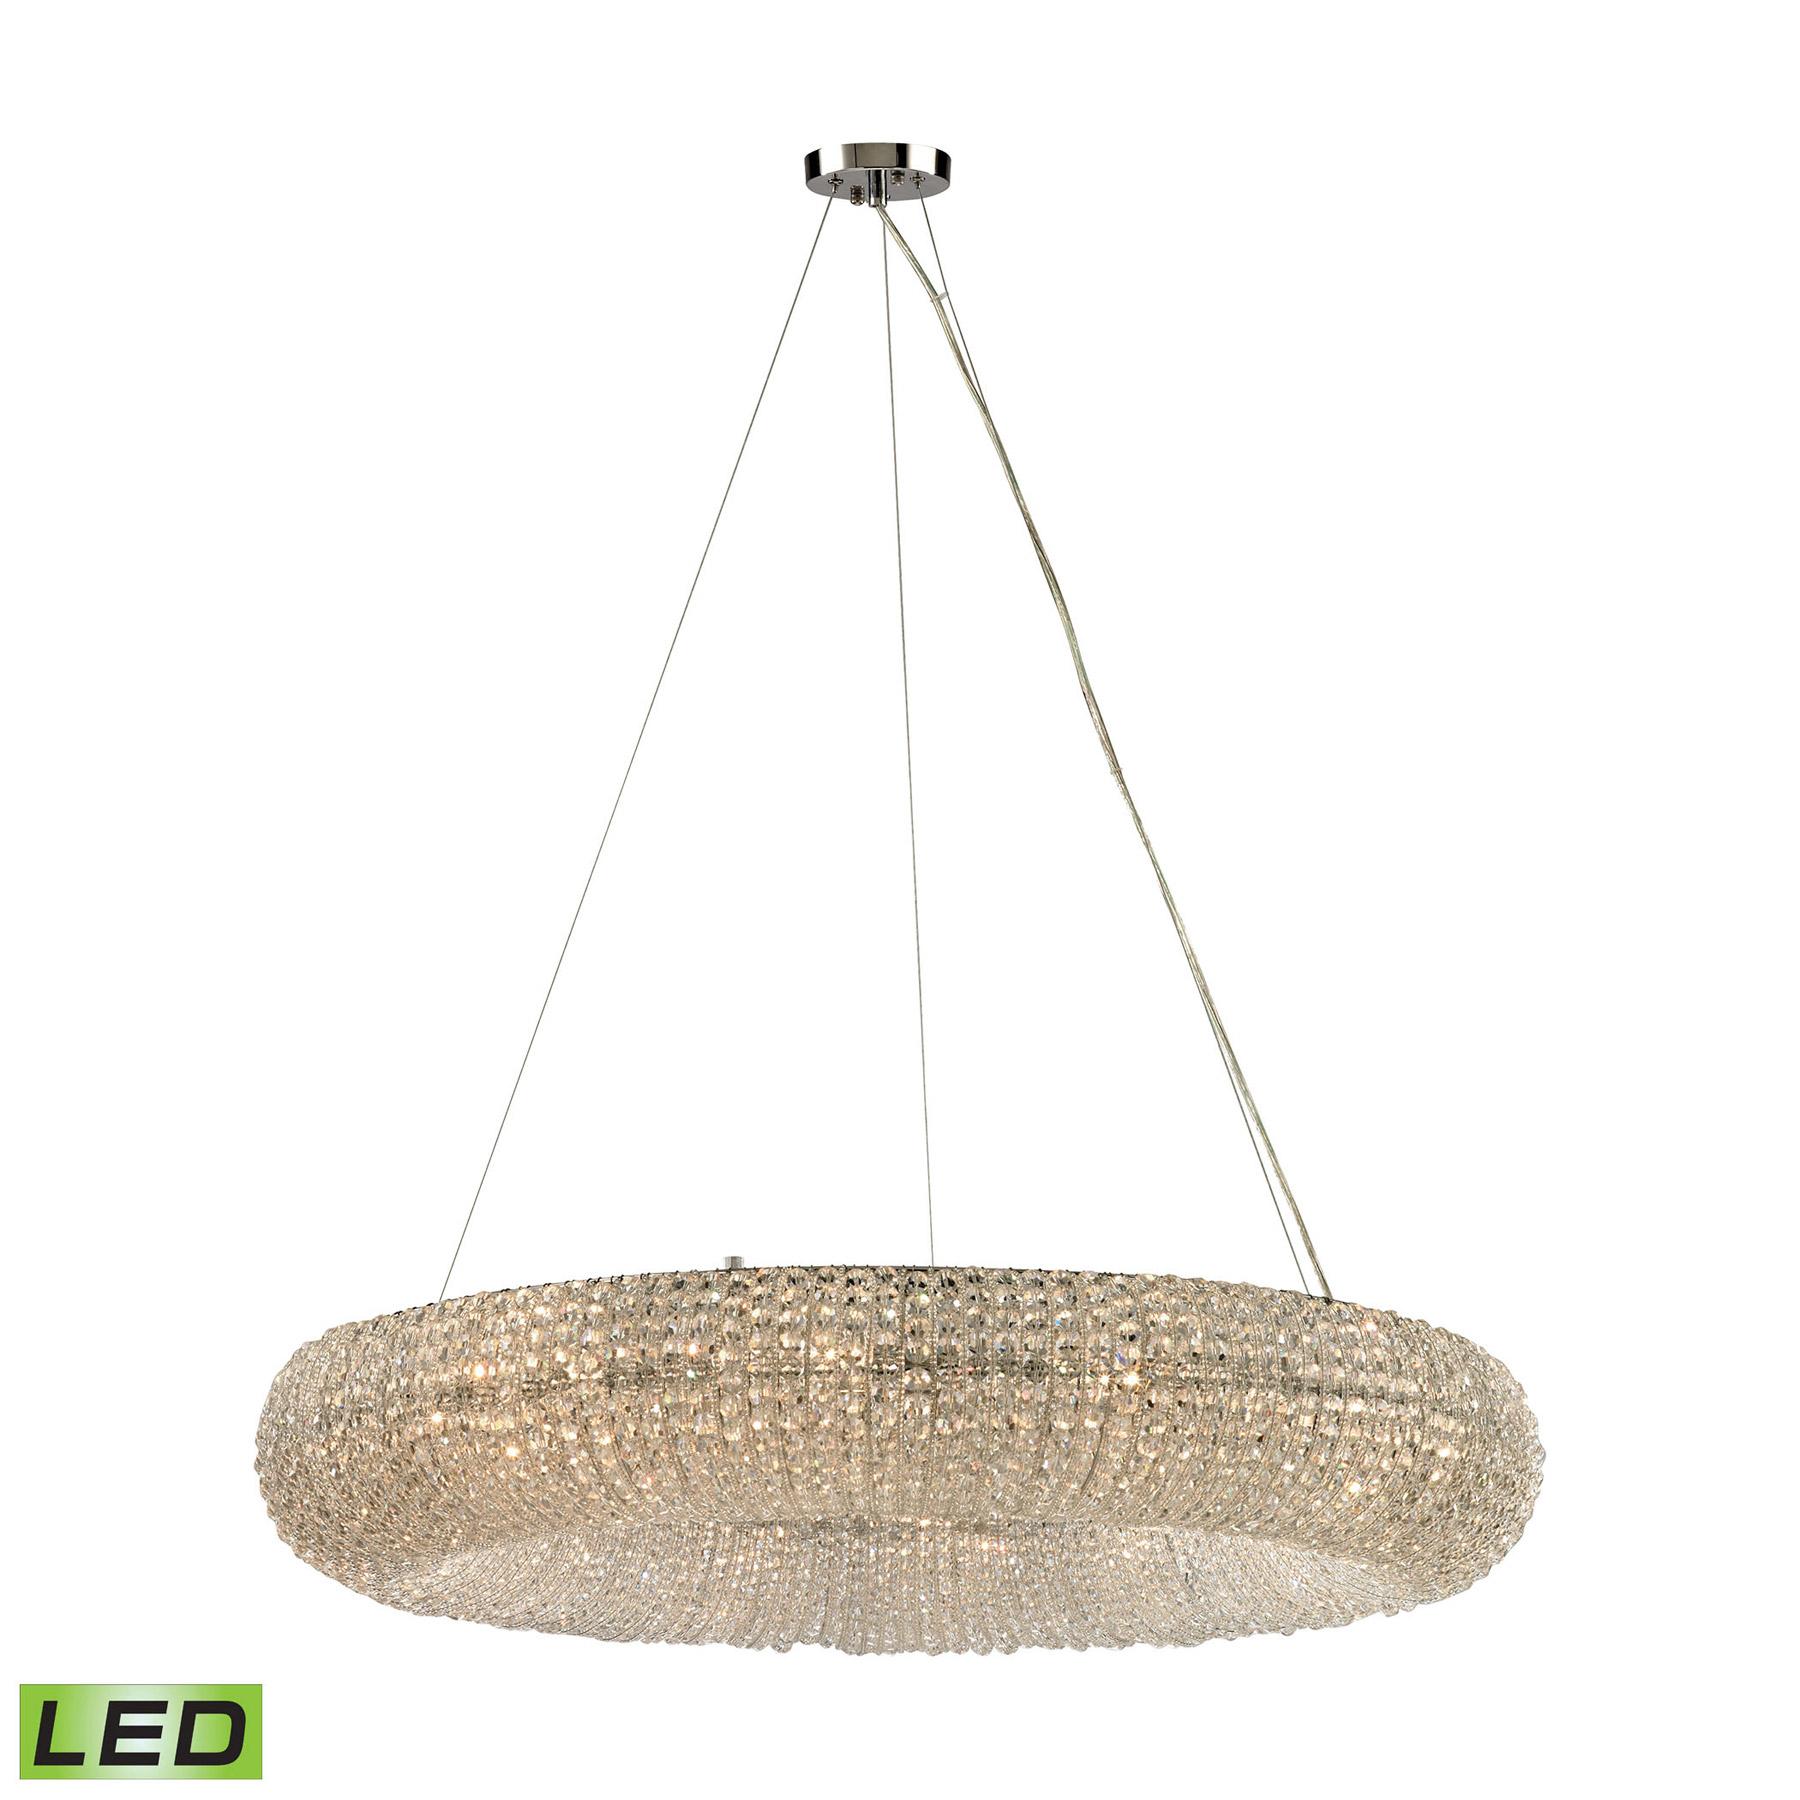 Lighting 12 LED Crystal Crystal Ring 12 Light LED Chandelier